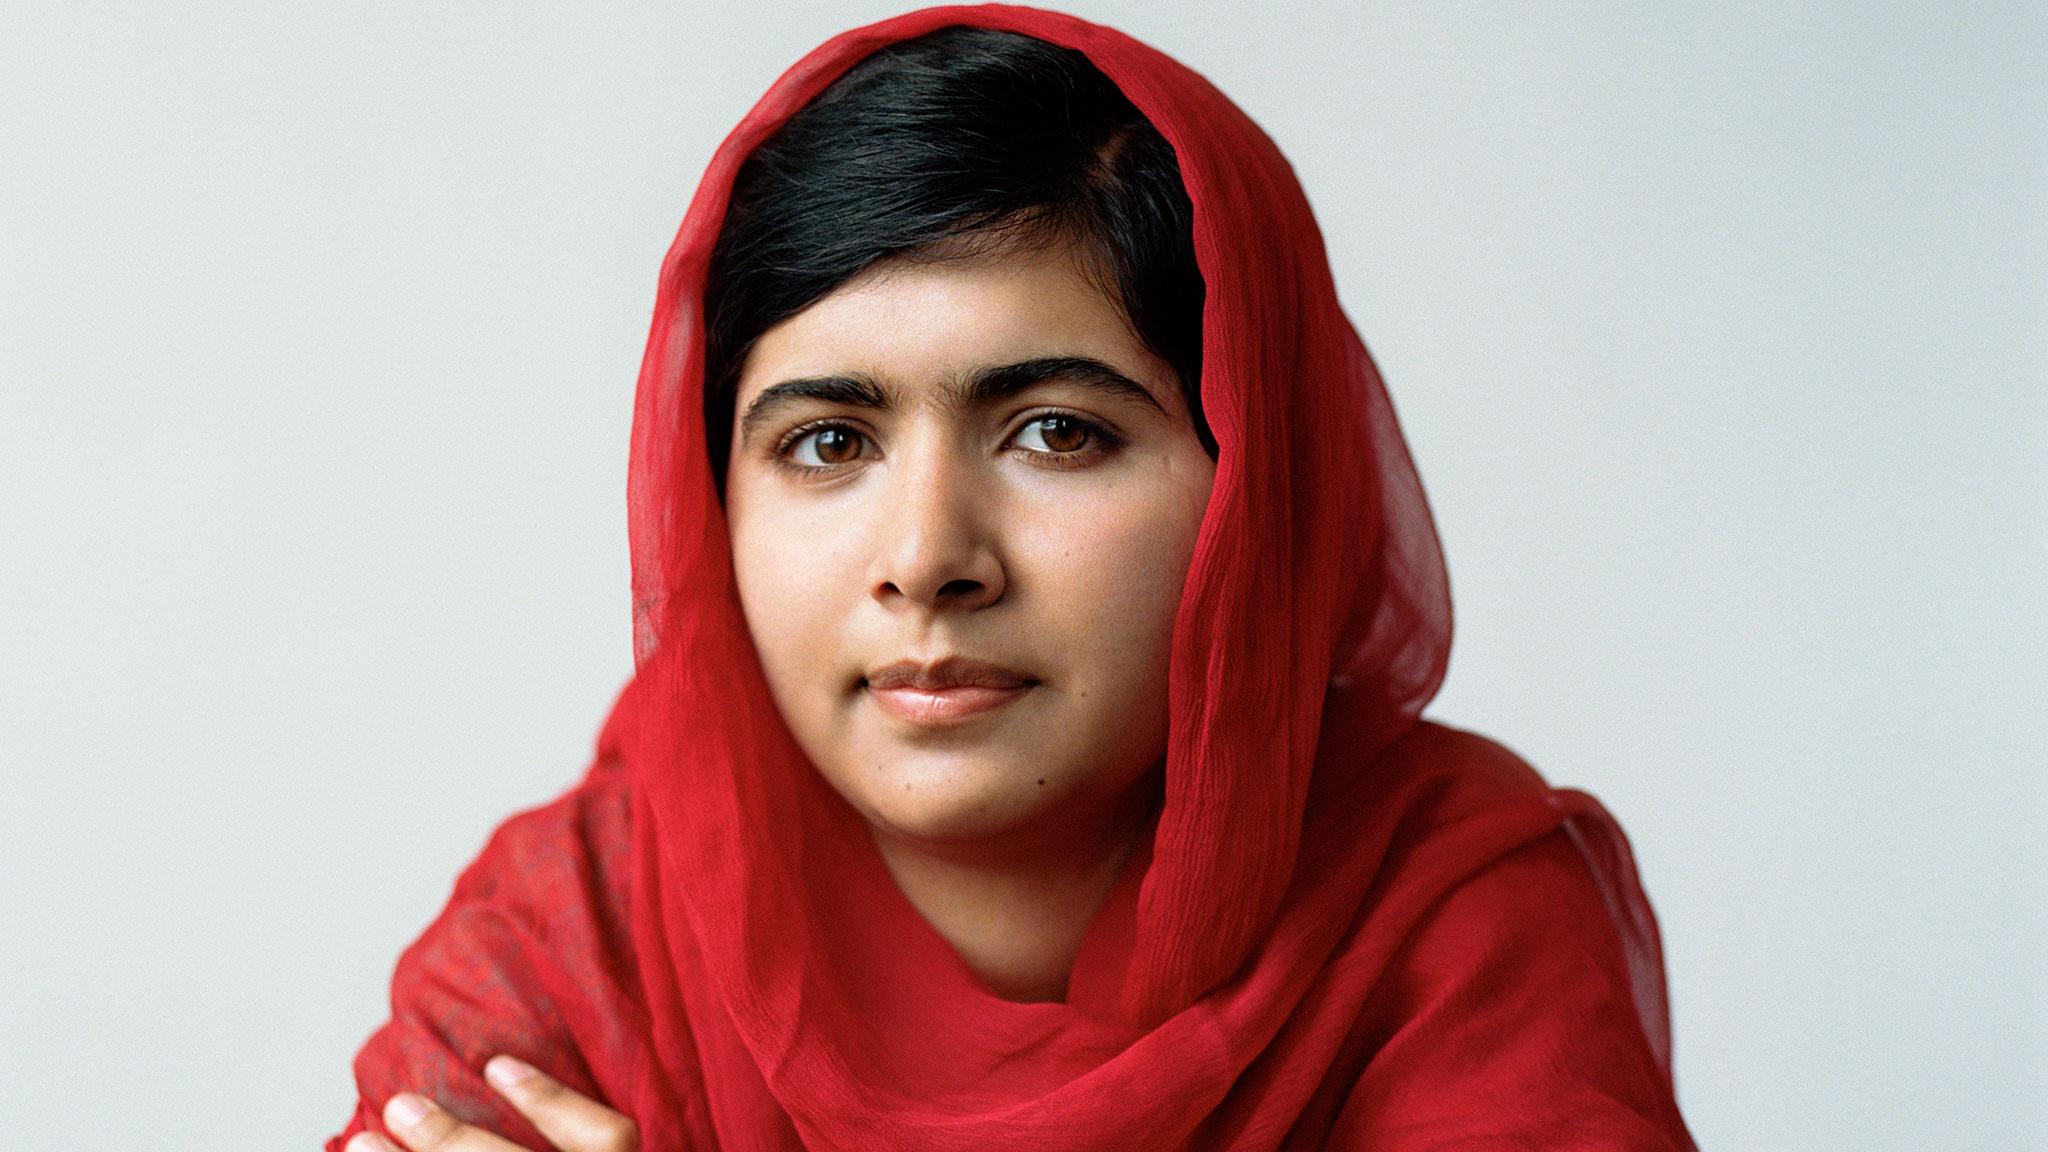 Malala e a liberdade de pensamento - Dulce Rocha